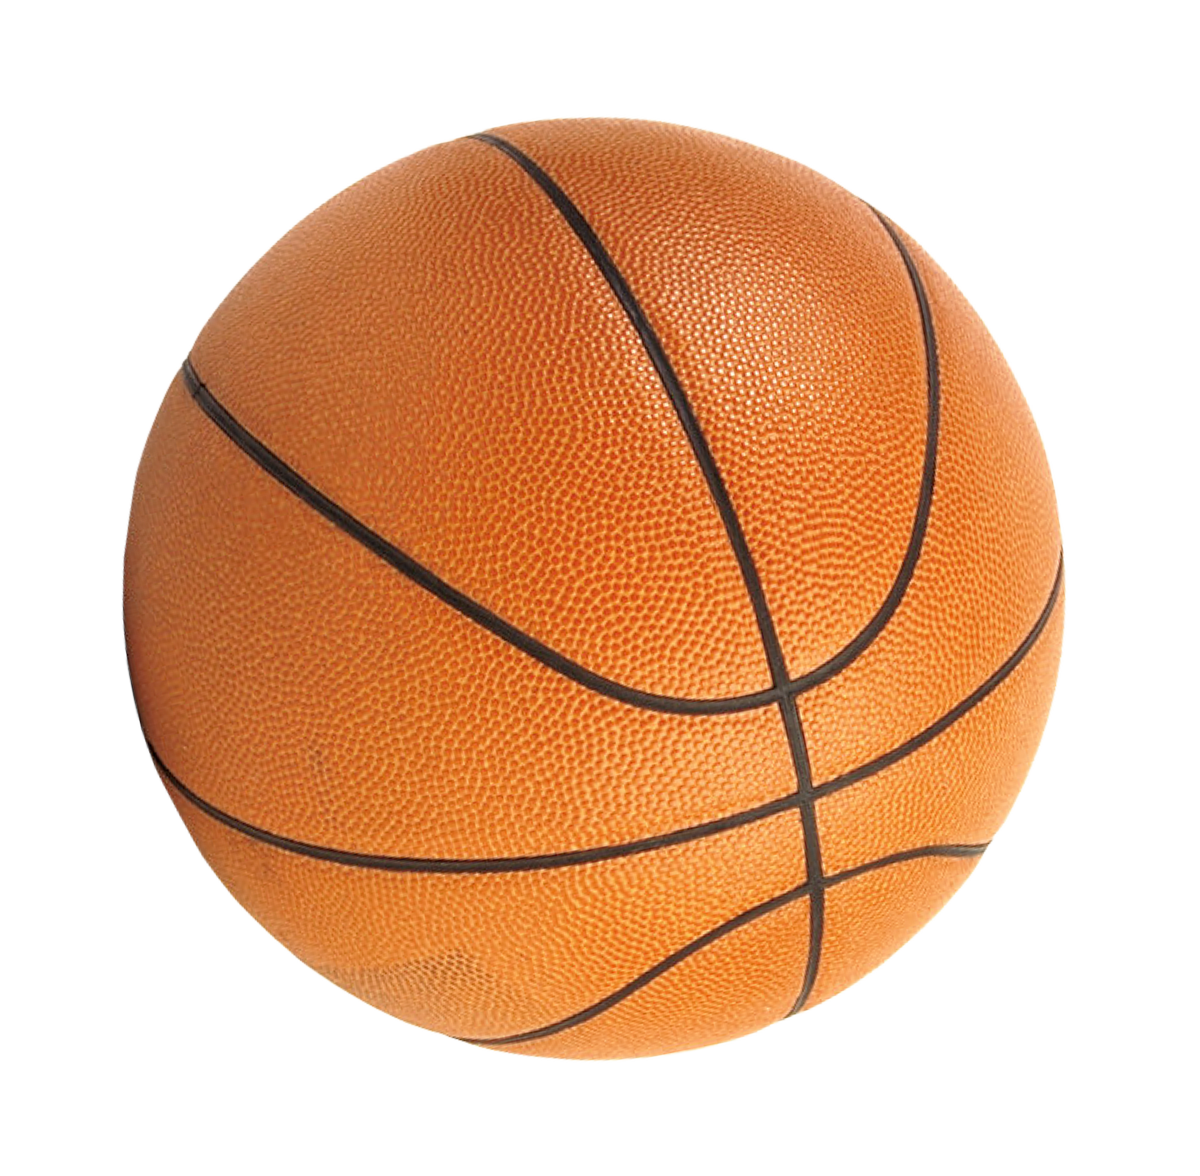 Basketball PNG Transparent Image - Basketball PNG